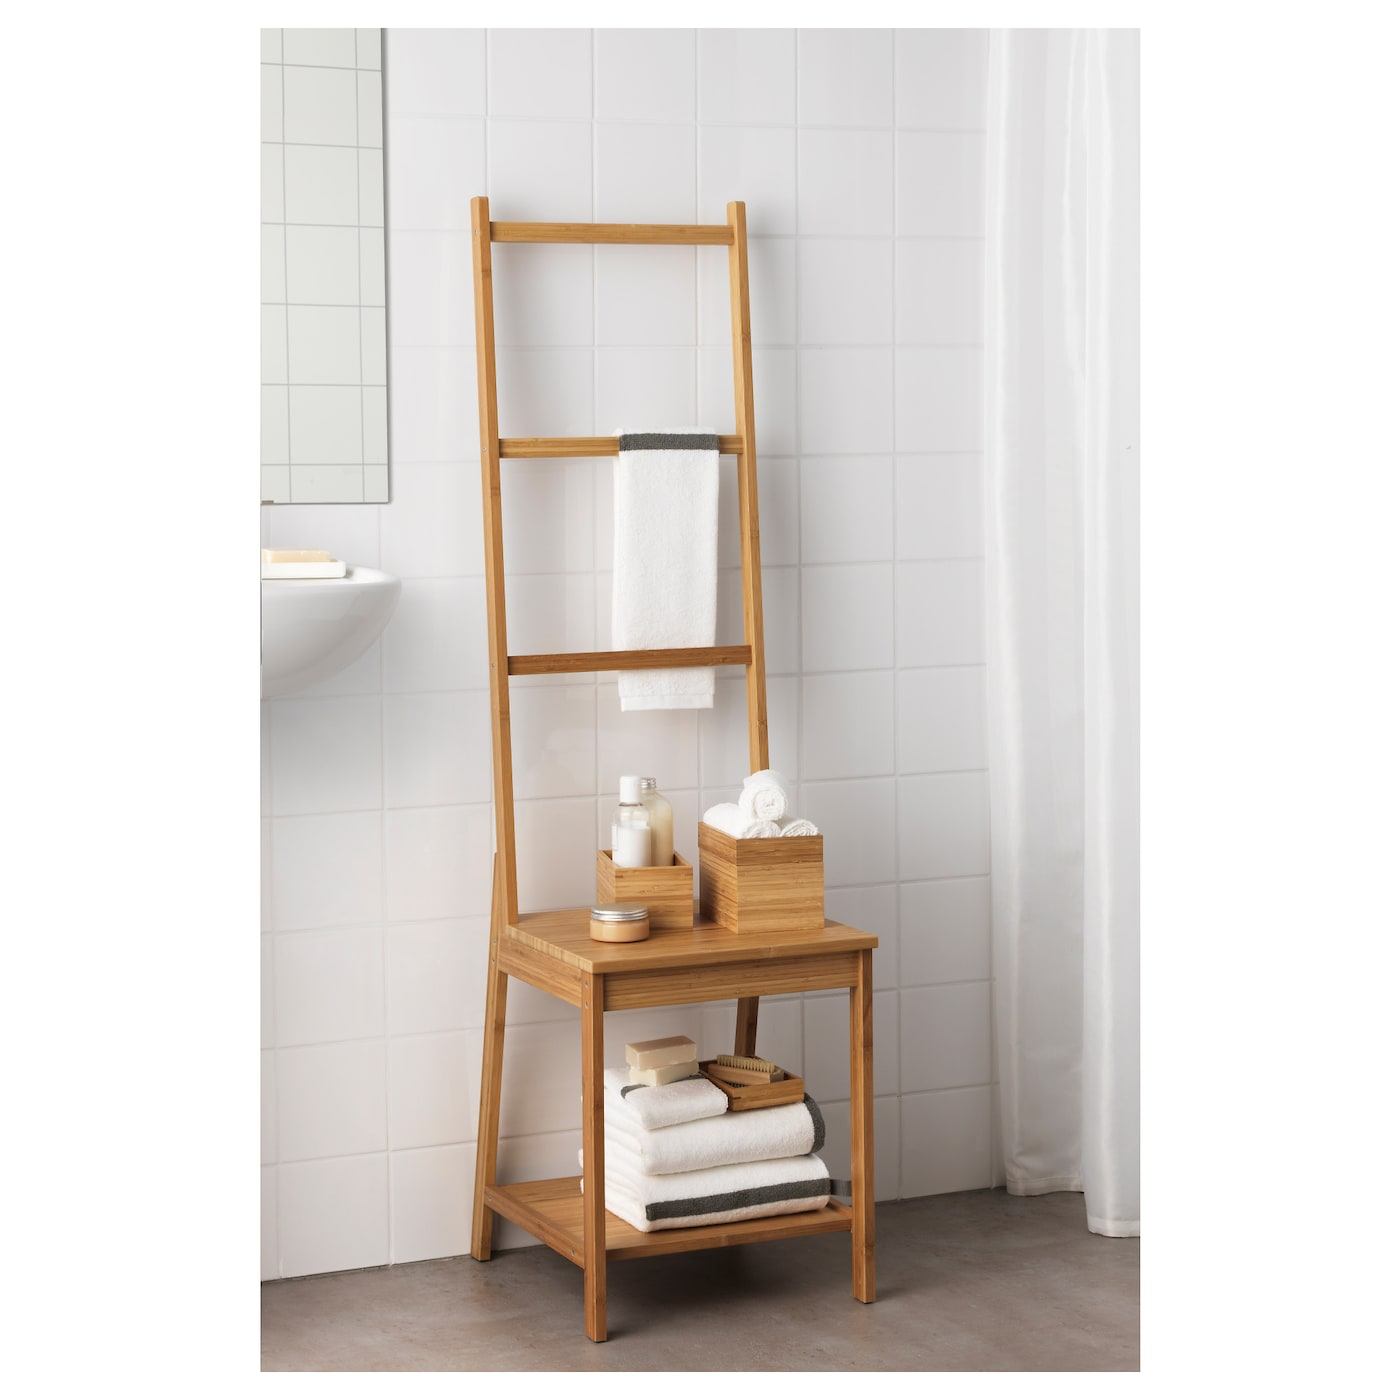 Ikea Ragrund Bamboo Towel Rack Chair